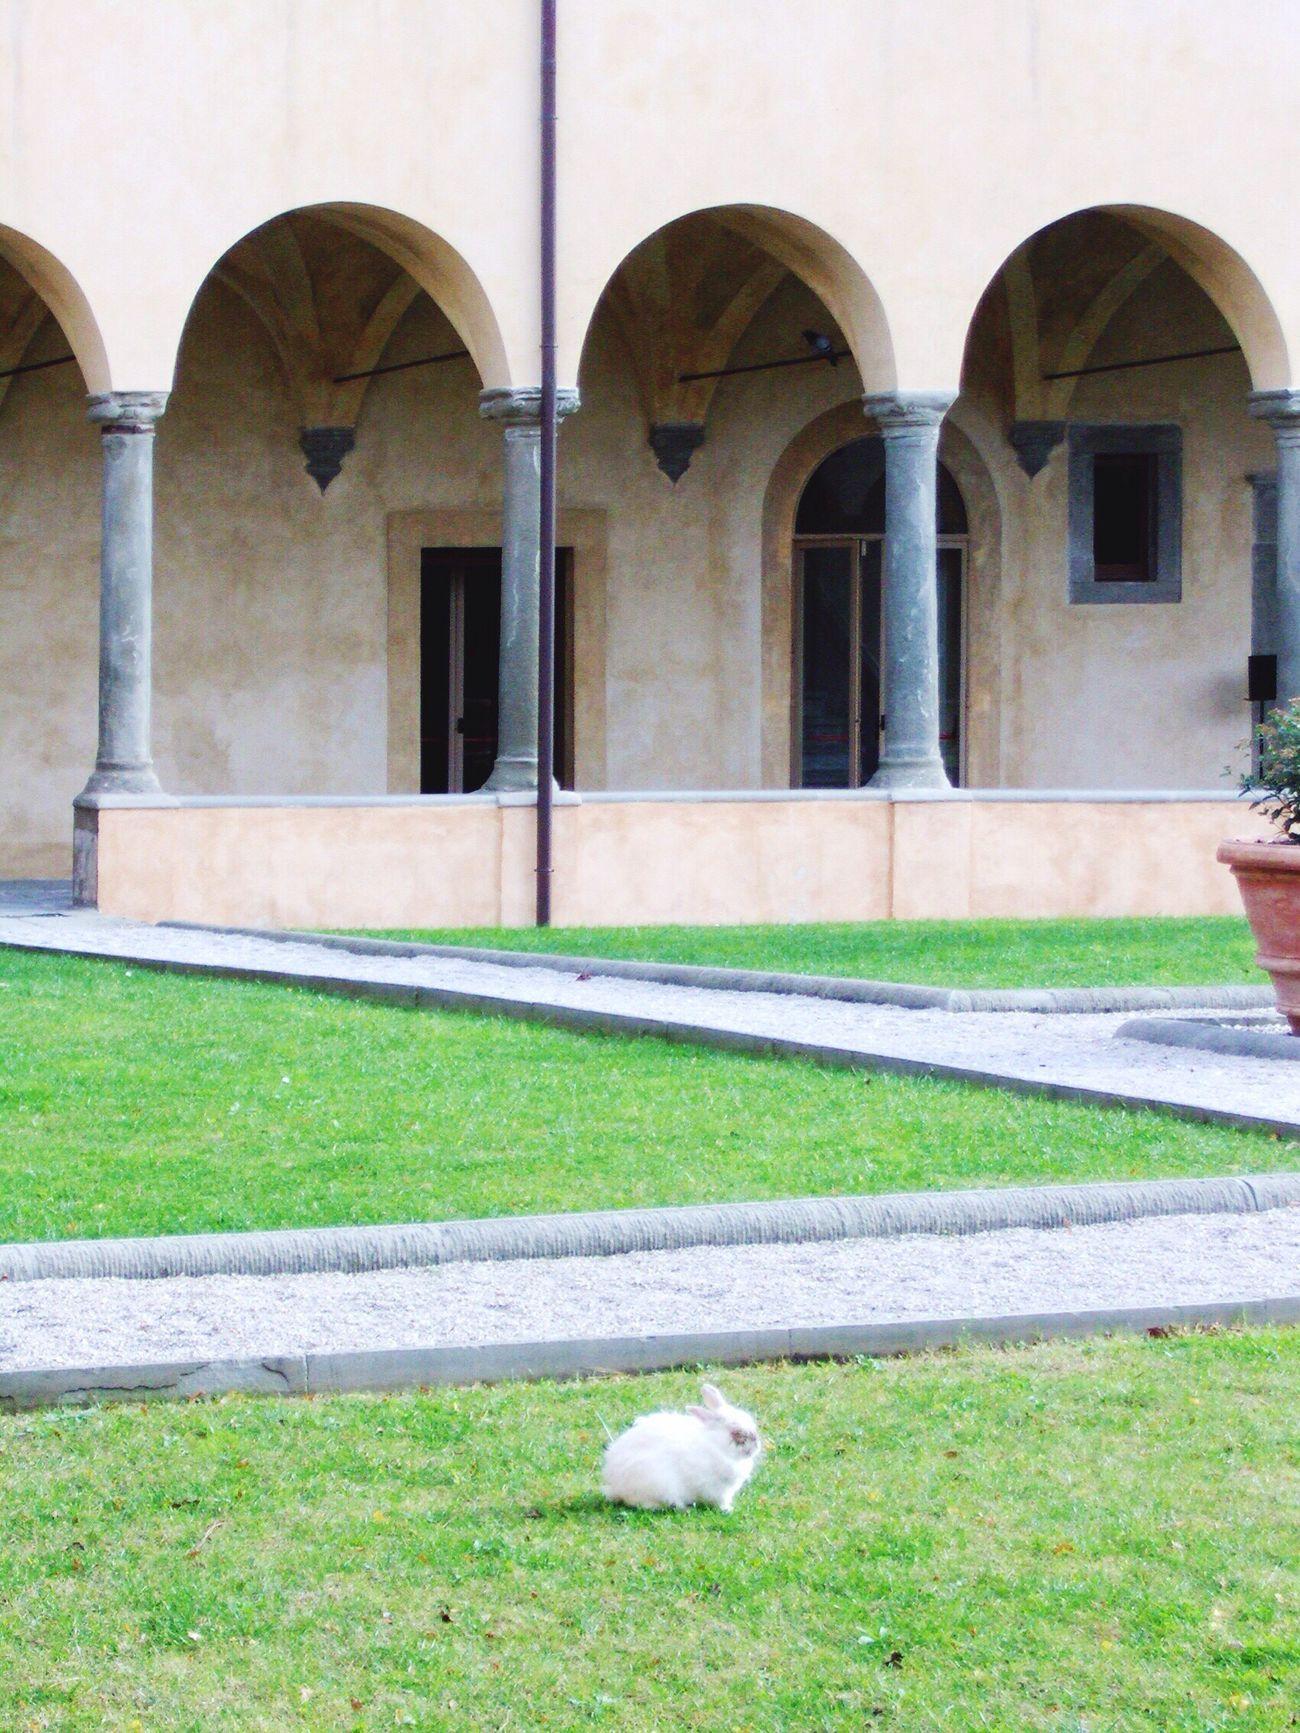 Coniglio. Architecture Animal Themes One Animal No People Pets Day Outdoors Scenics Pisa Rabbit Rabbits 🐇 Grass Monastery Italia Italy❤️ Kaninchen